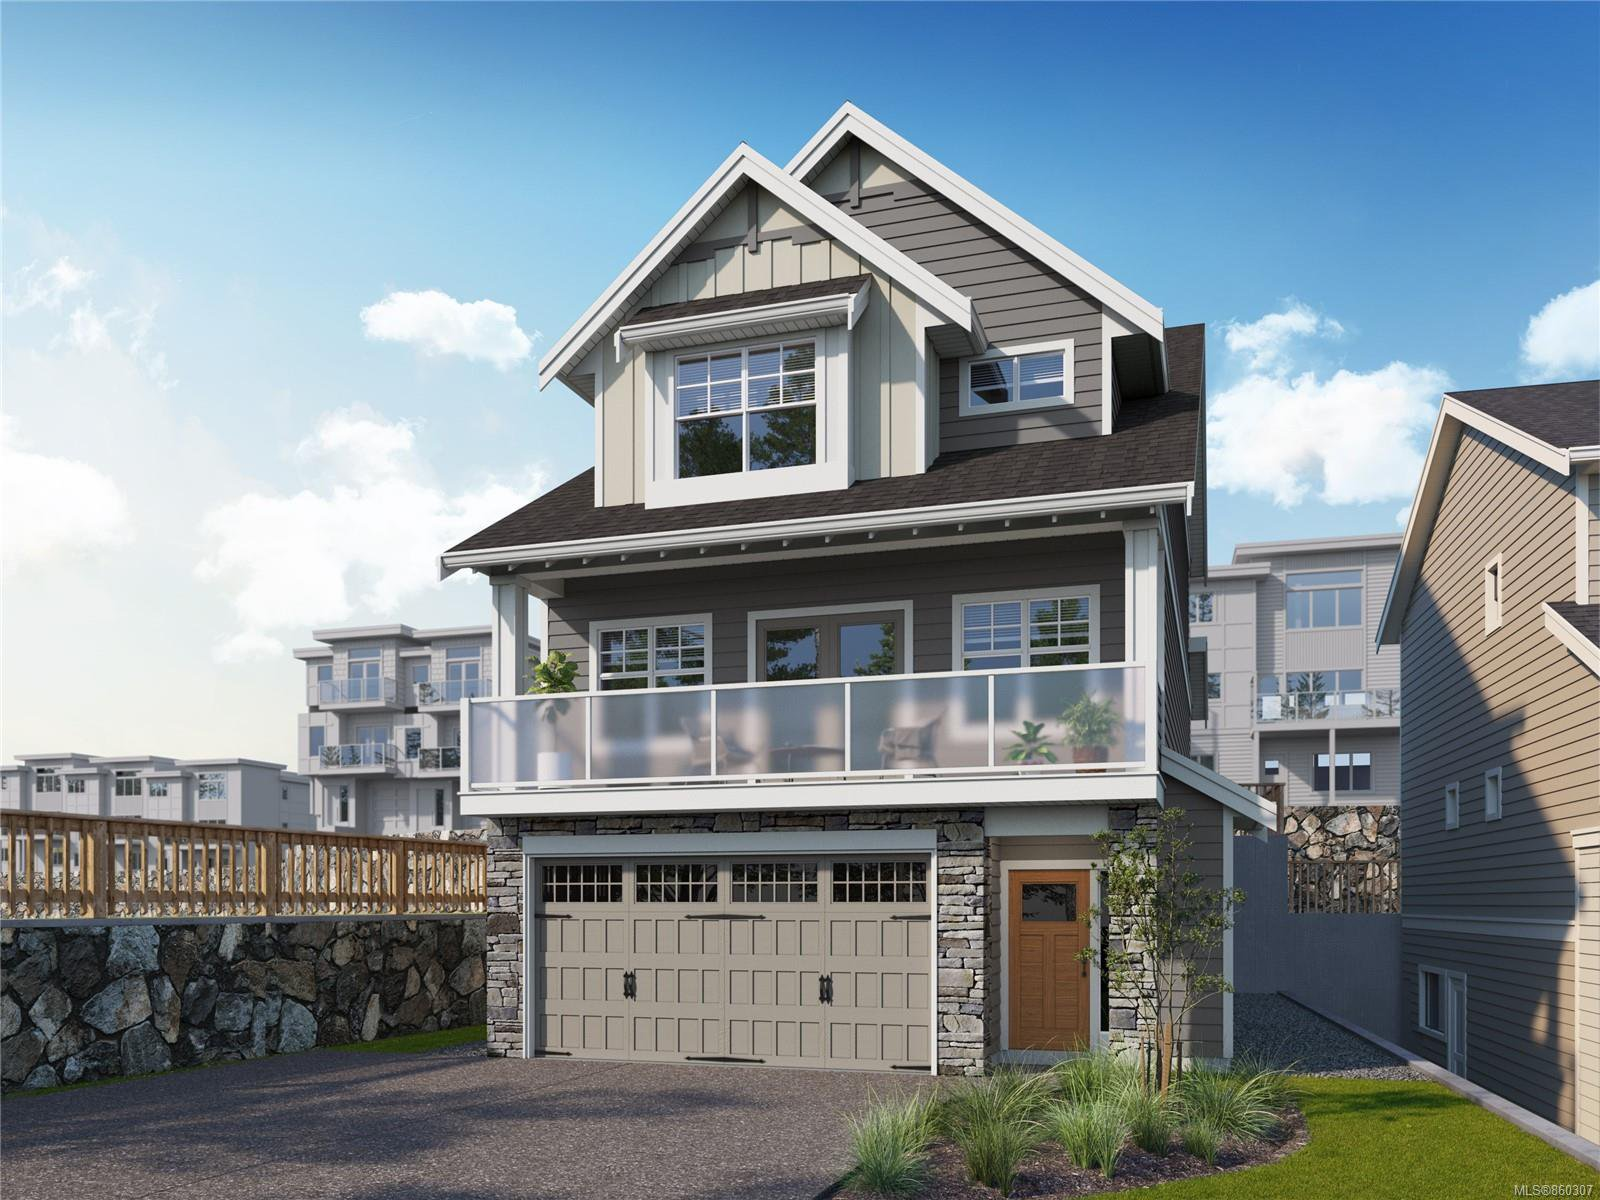 Main Photo: 1332 Flint Ave in : La Bear Mountain House for sale (Langford)  : MLS®# 860307